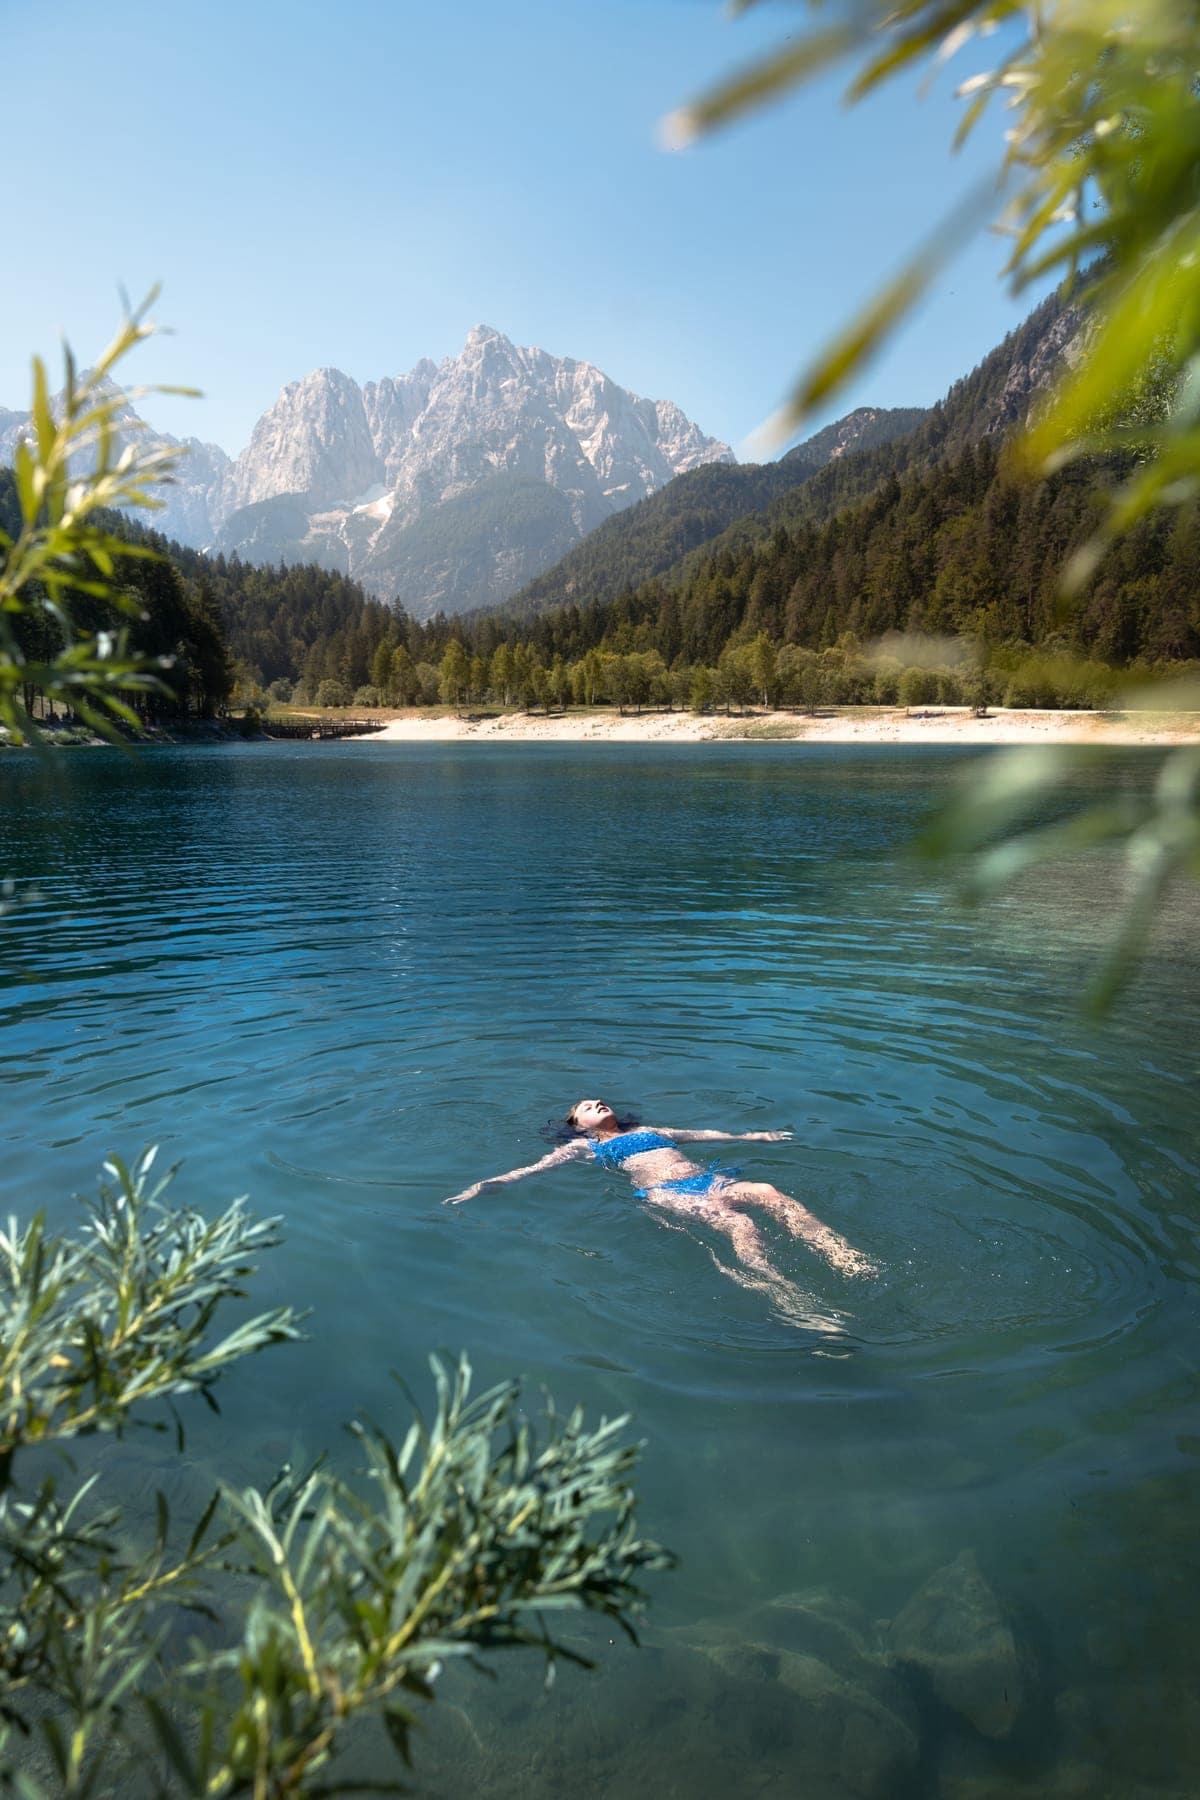 Slovenia_LakeJasna